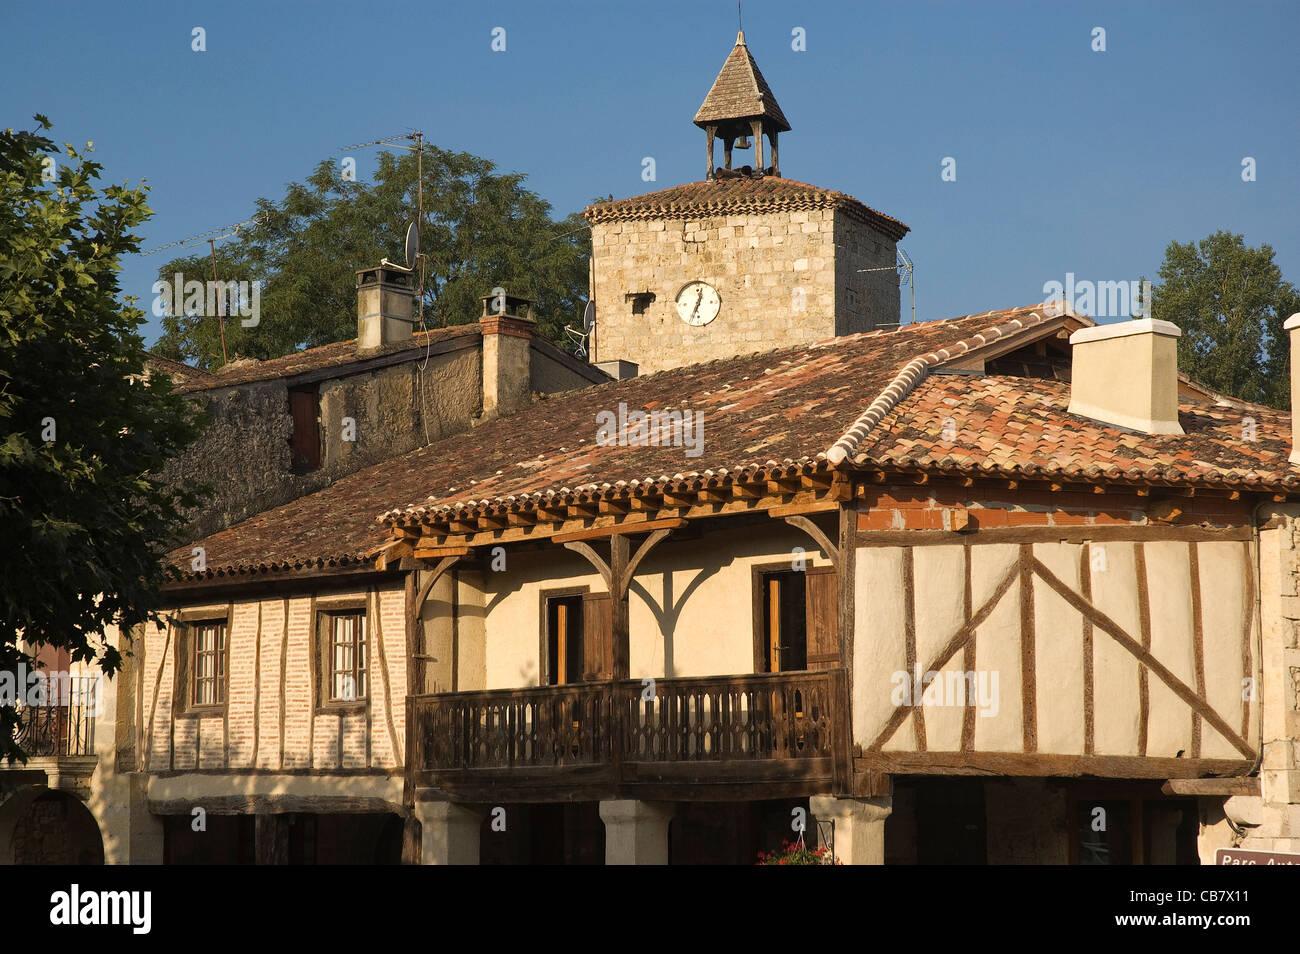 Elk196-1739 Francia, Aquitania Fources, arquitectura tradicional. Imagen De Stock